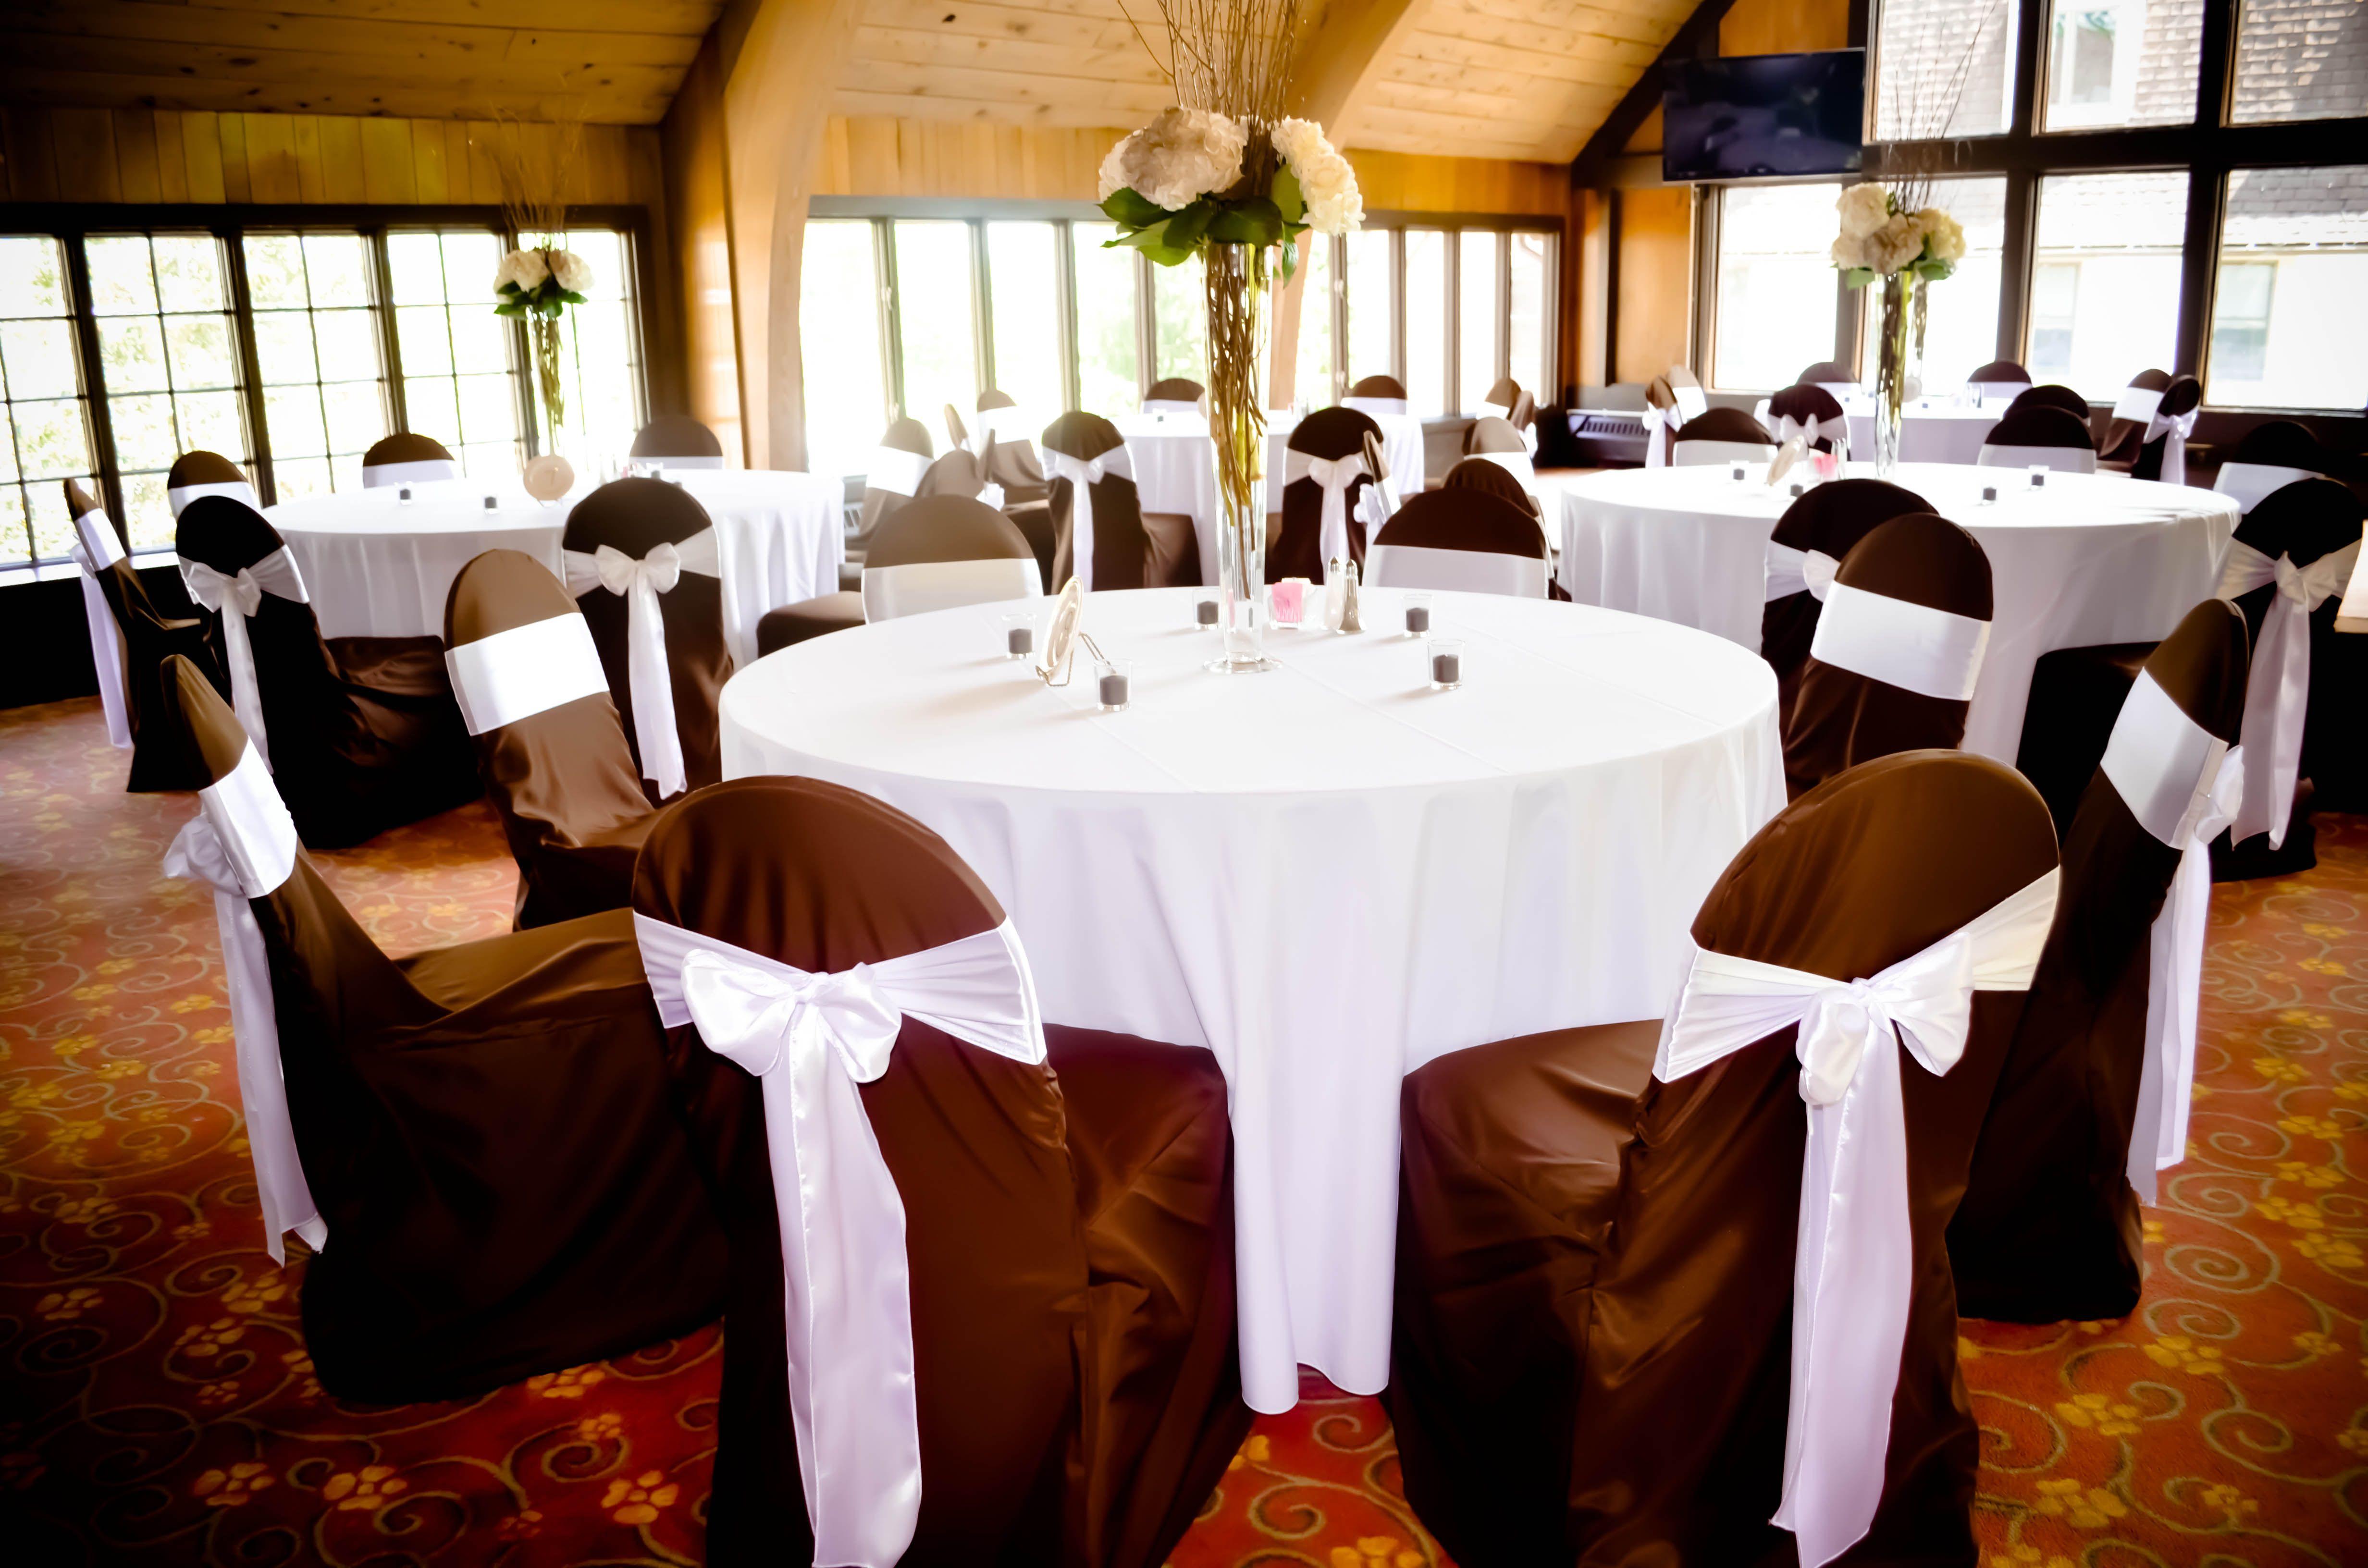 Brown Banquet Chair Covers & White Satin Chair Sashes